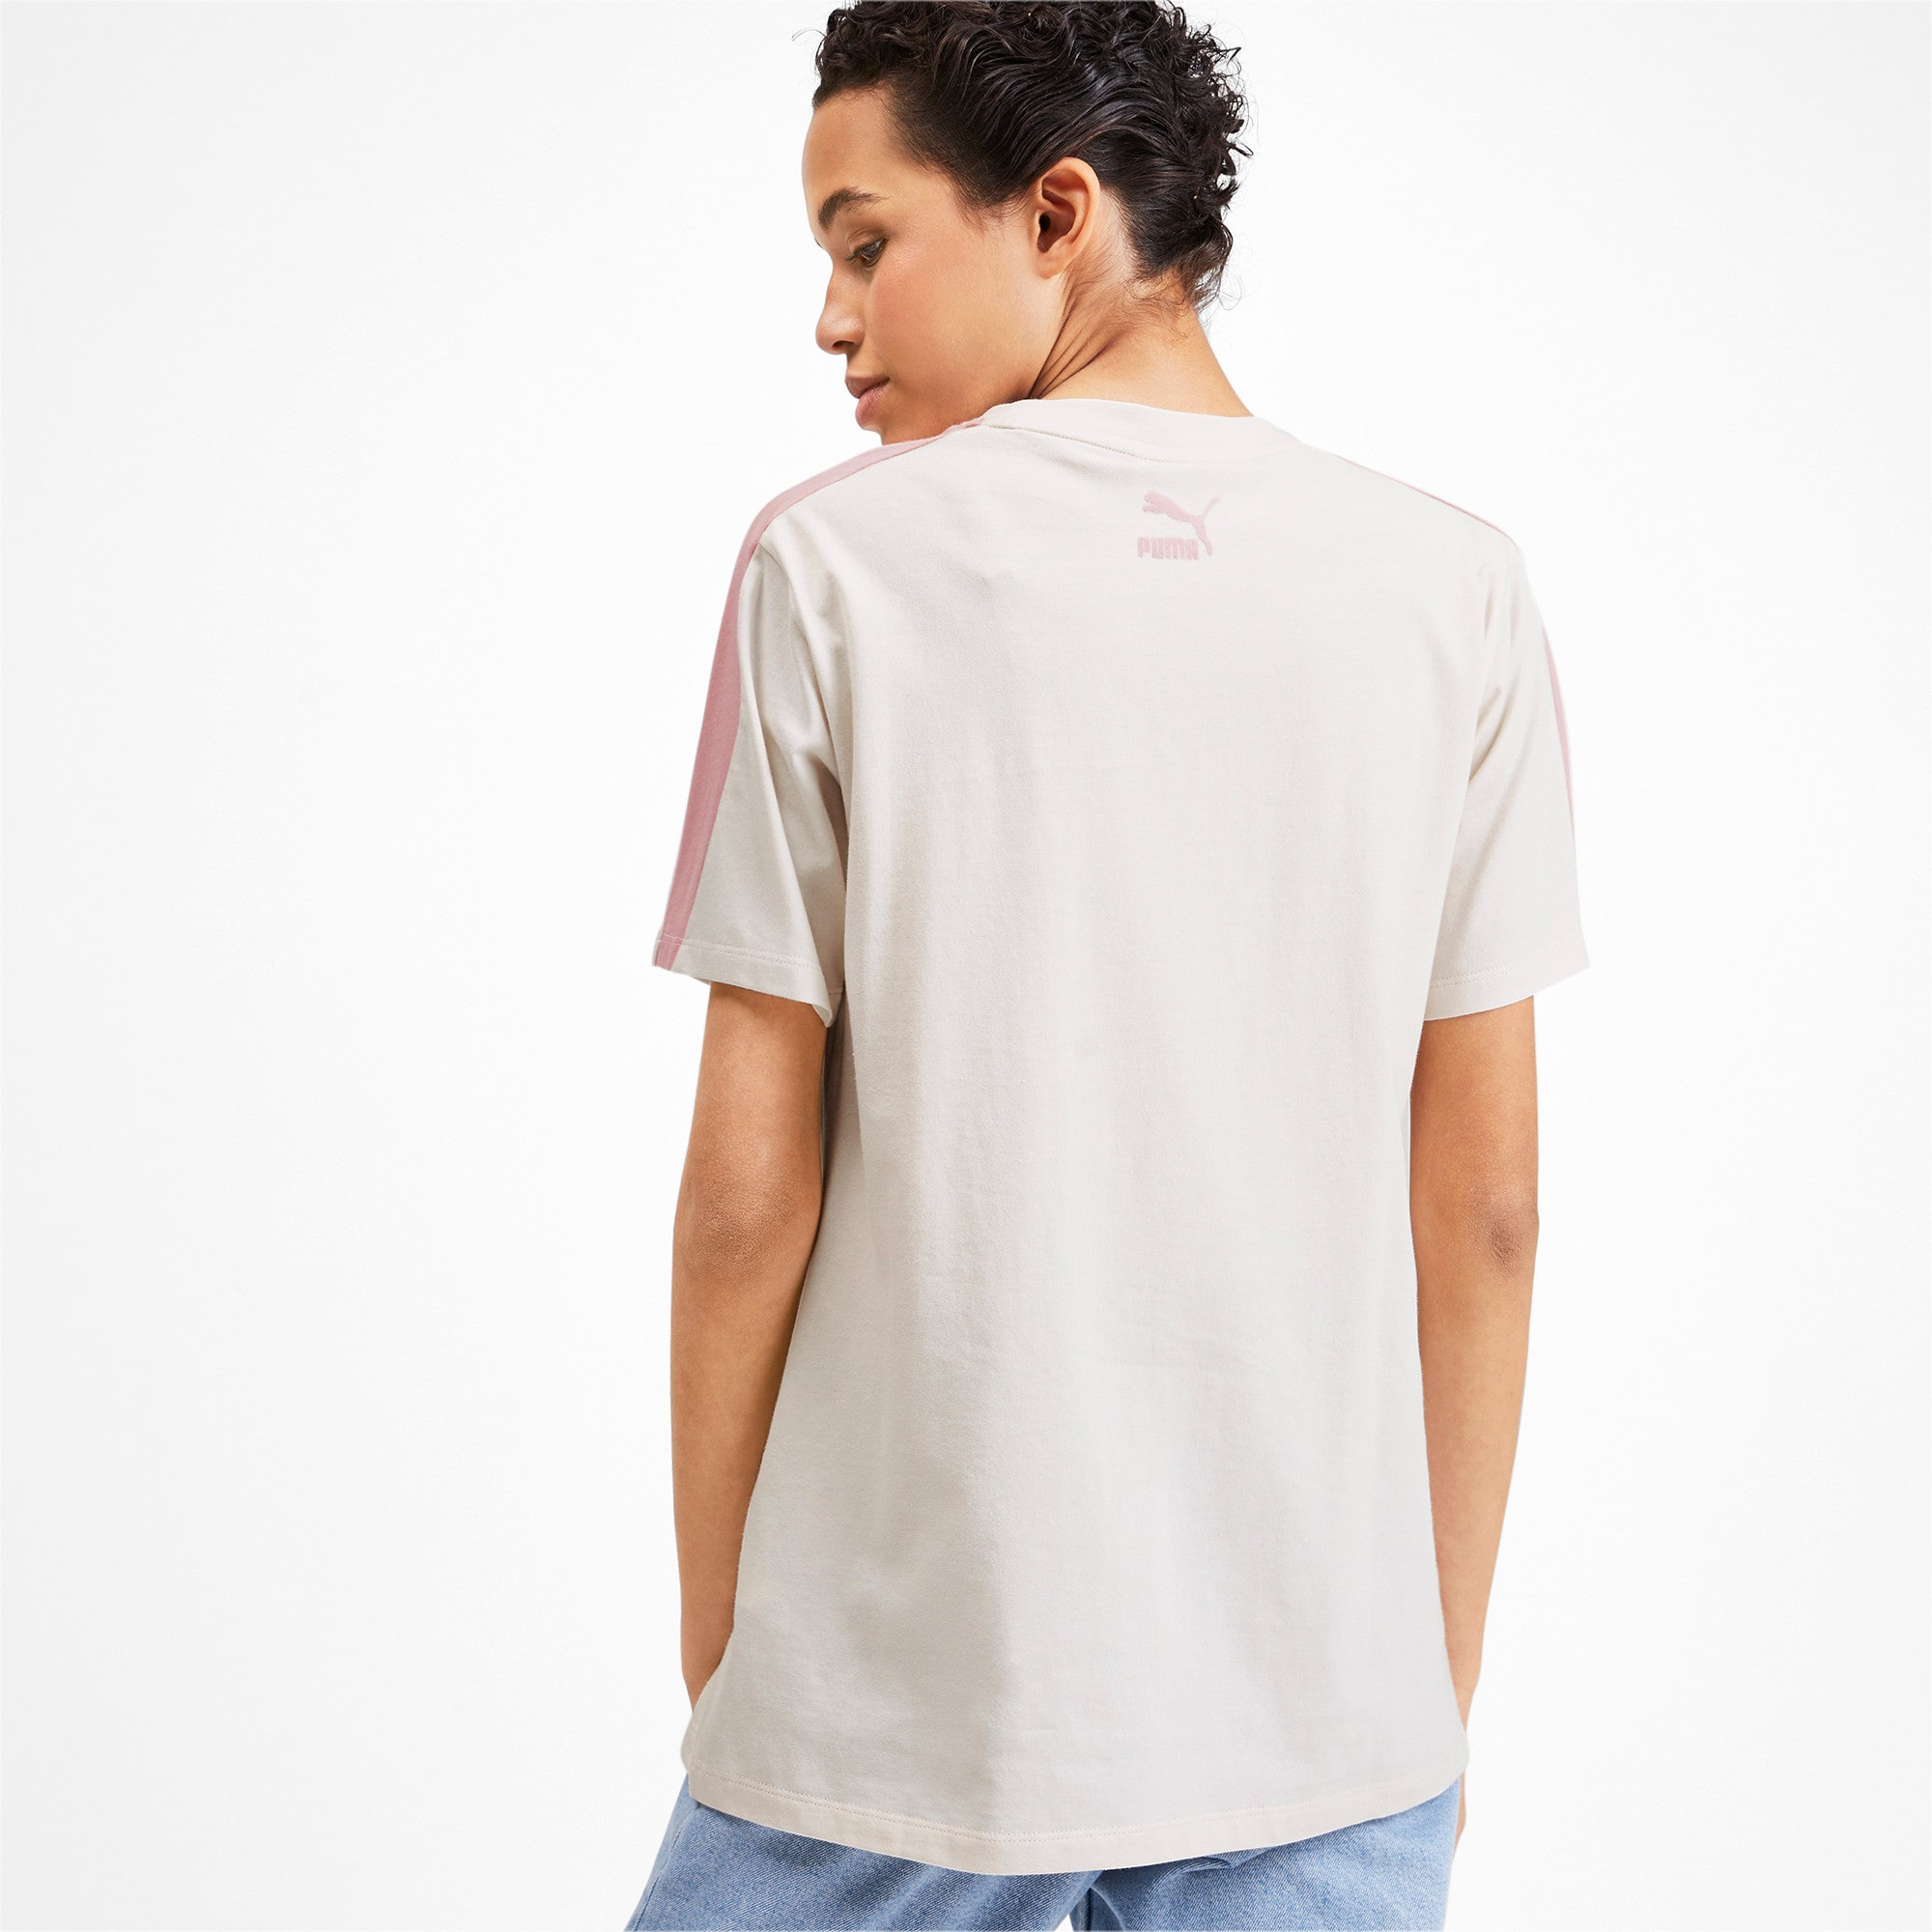 Miniatura 3 de Camiseta Classics No.2 T7 para mujer, Pastel Parchment, mediano